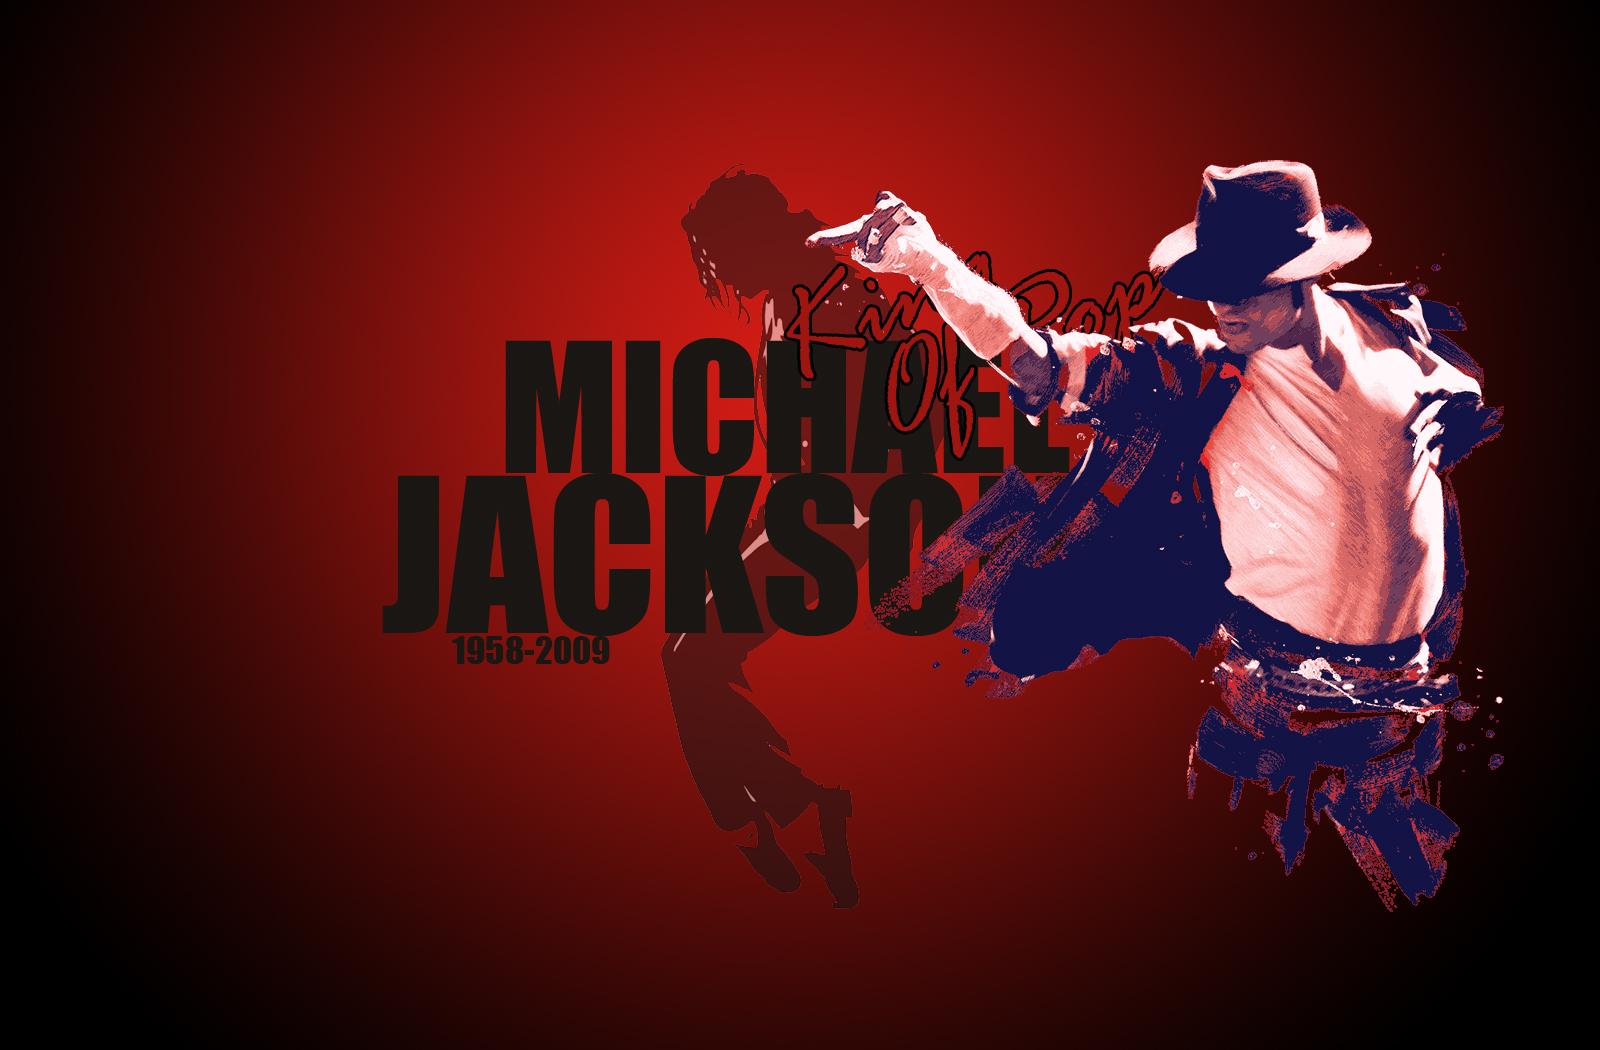 Best Wallpaper: Michael Jackson Wallpapers